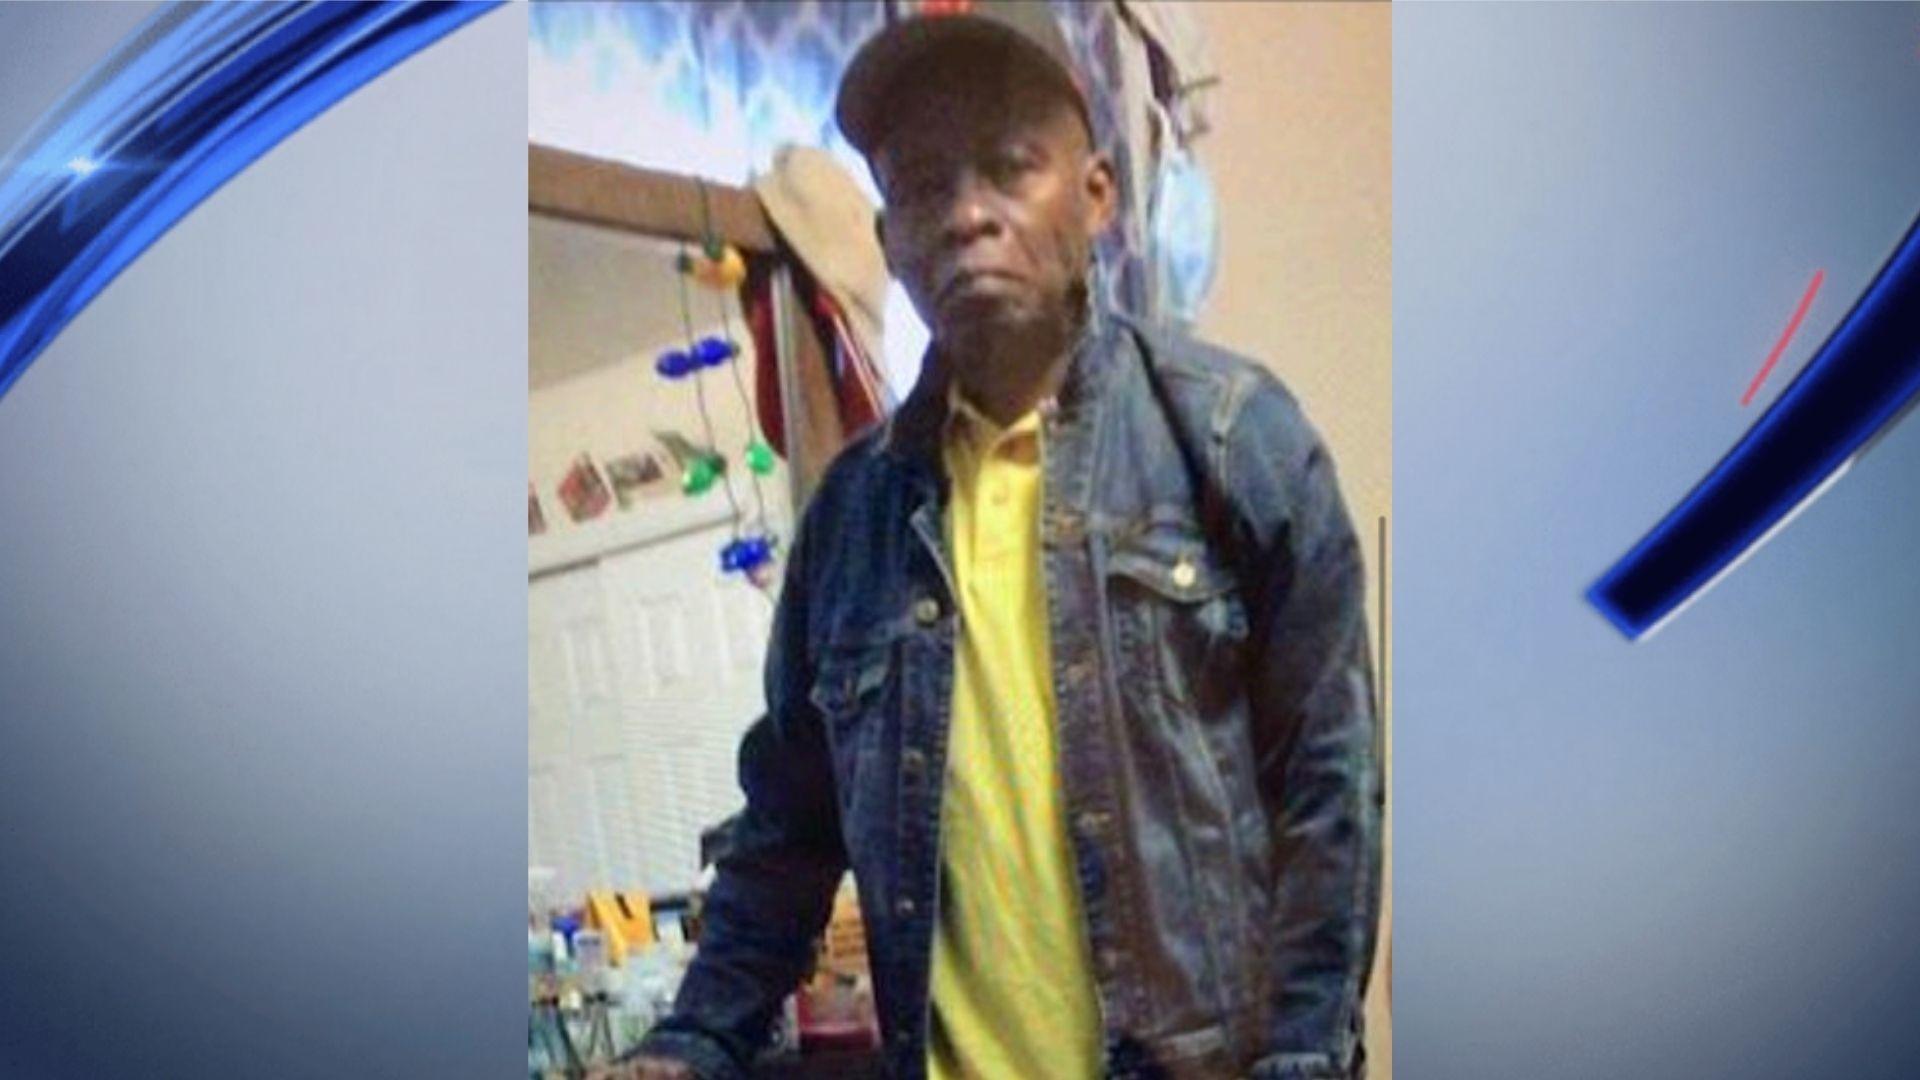 Missing Newark man last seen in Queens, NYC